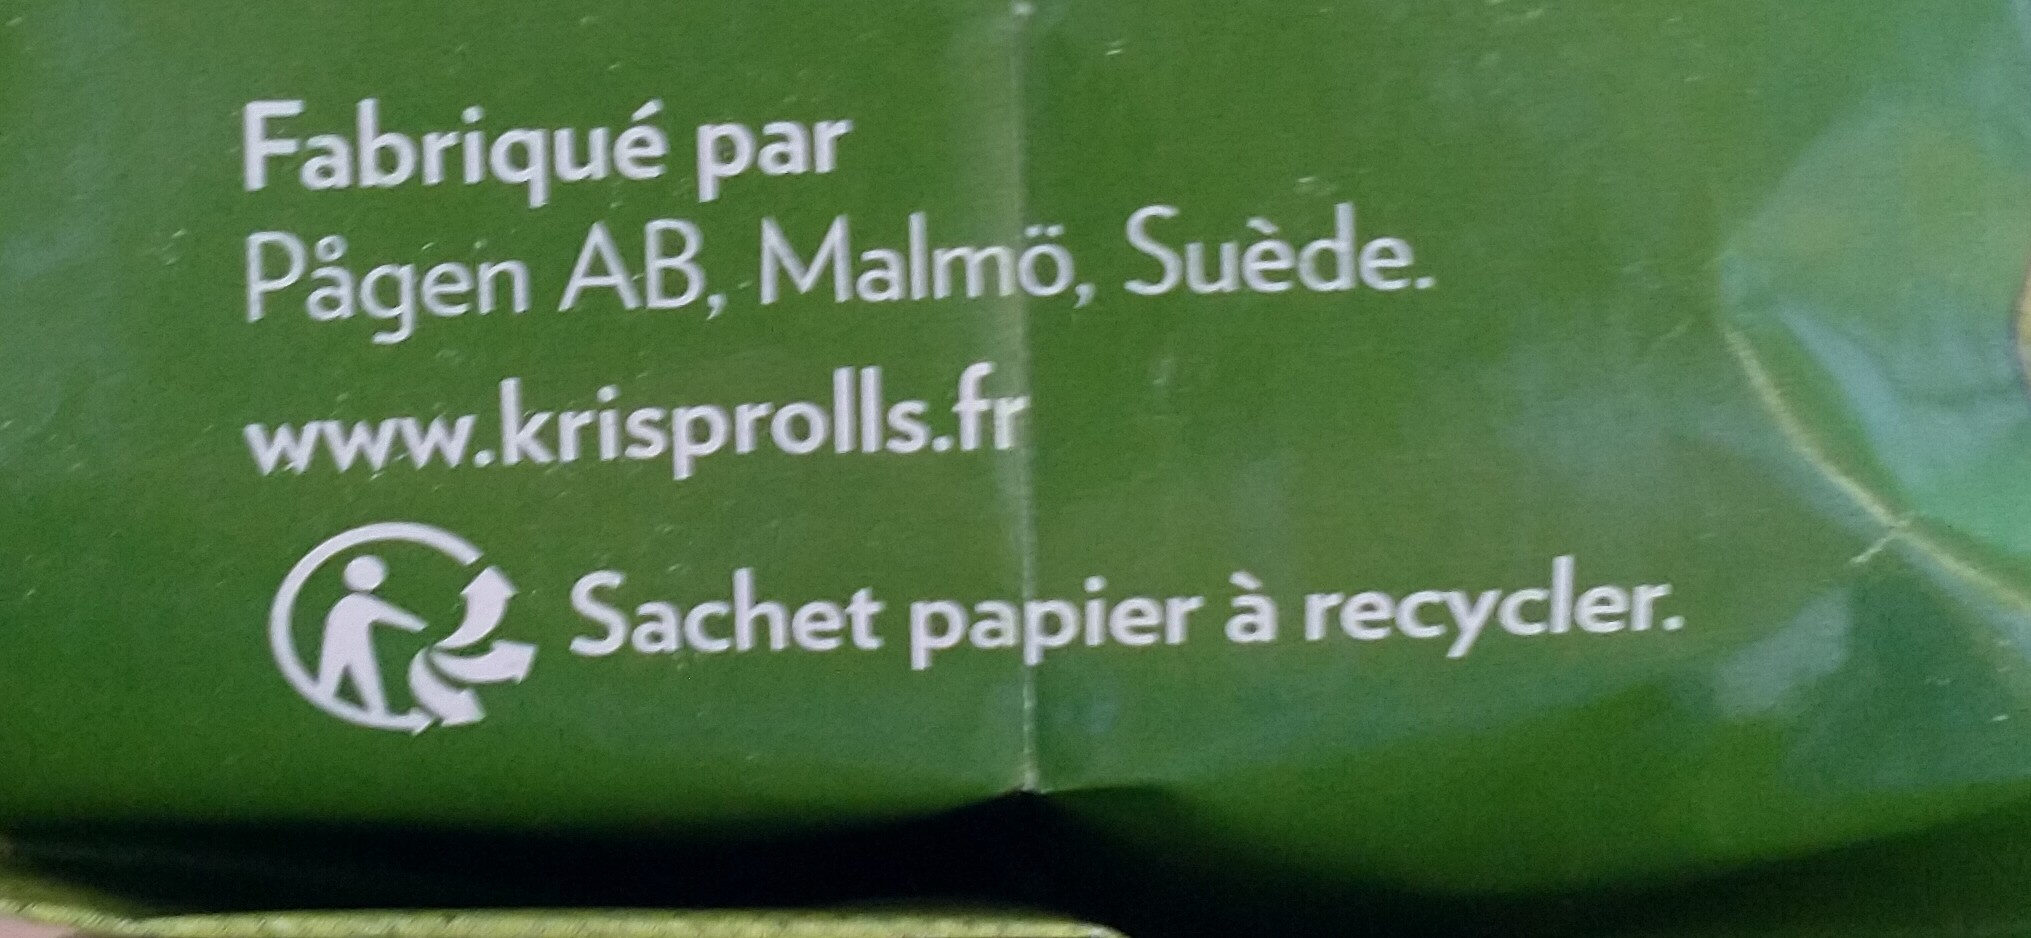 Krisprolls Complets Sans sucres ajoutés - Recyclinginstructies en / of verpakkingsinformatie - fr